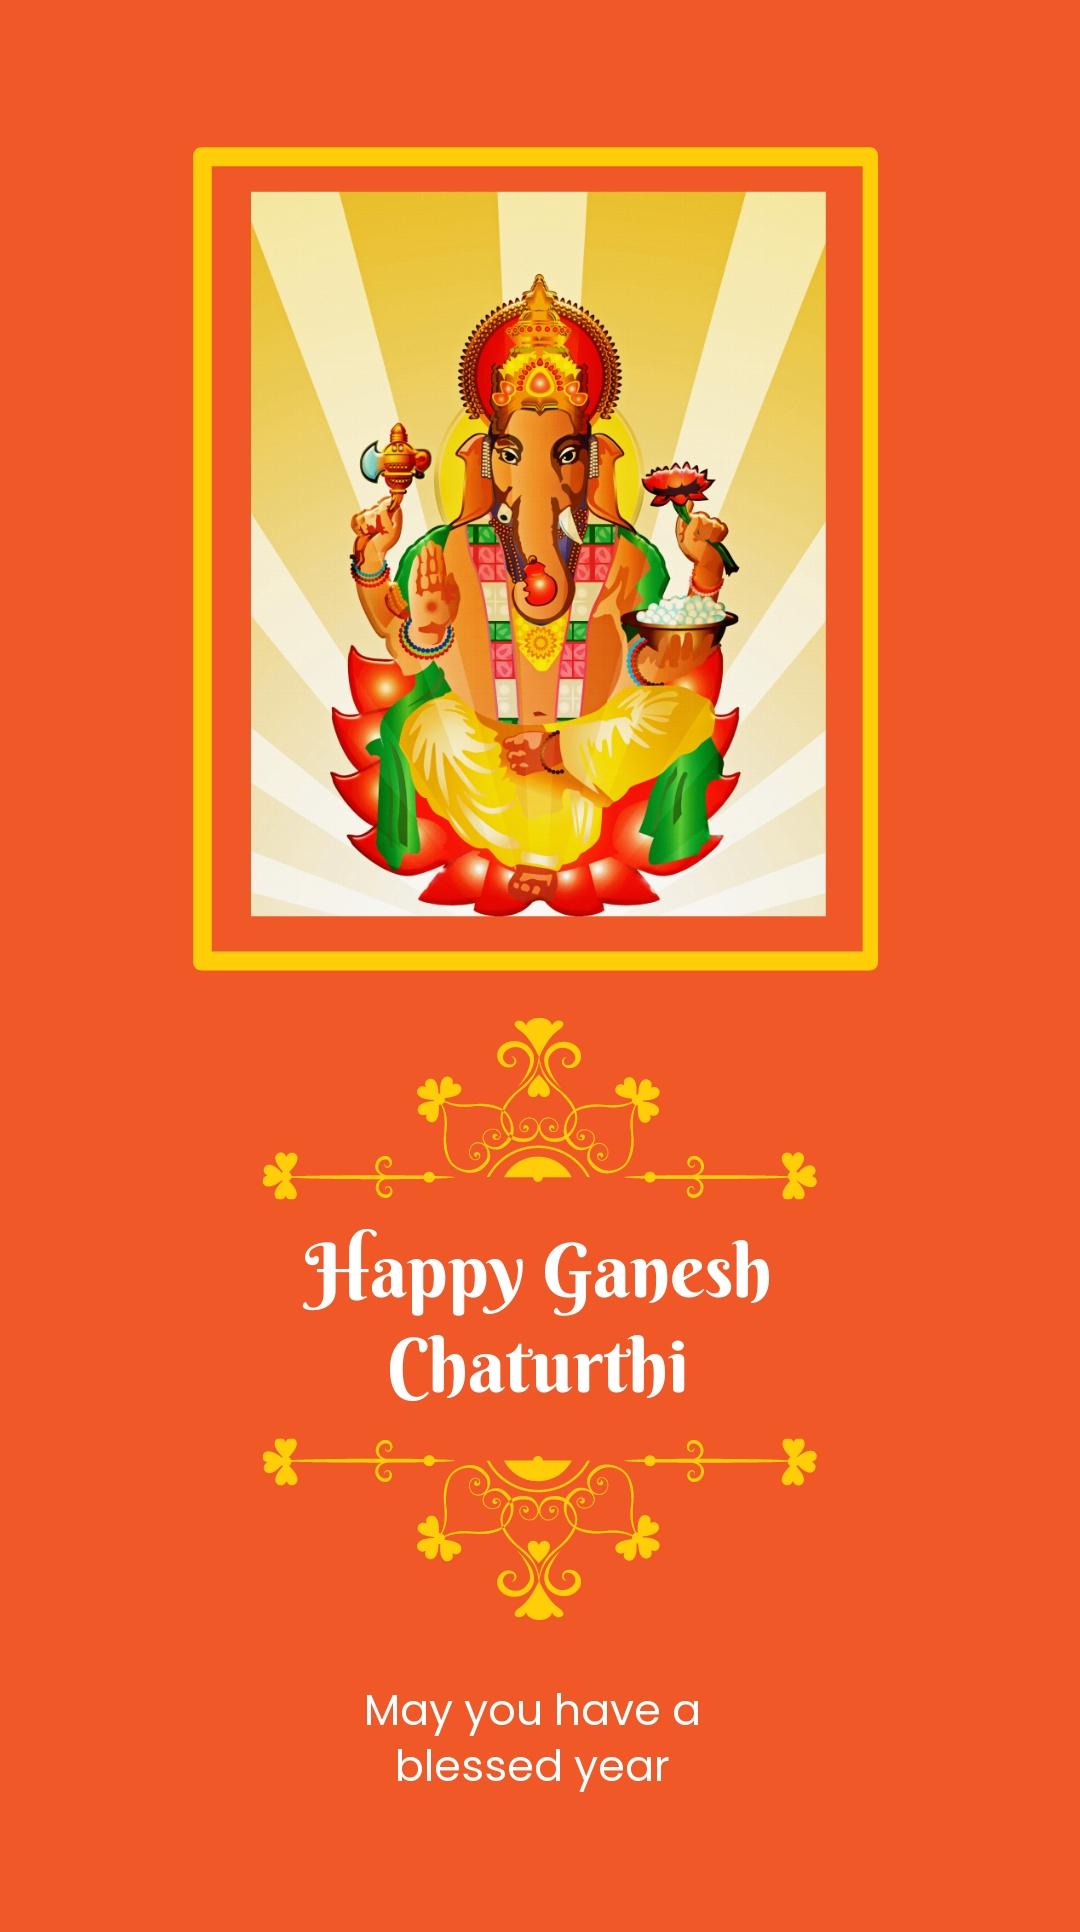 Happy Ganesh Chaturthi Instagram Story Template.jpe